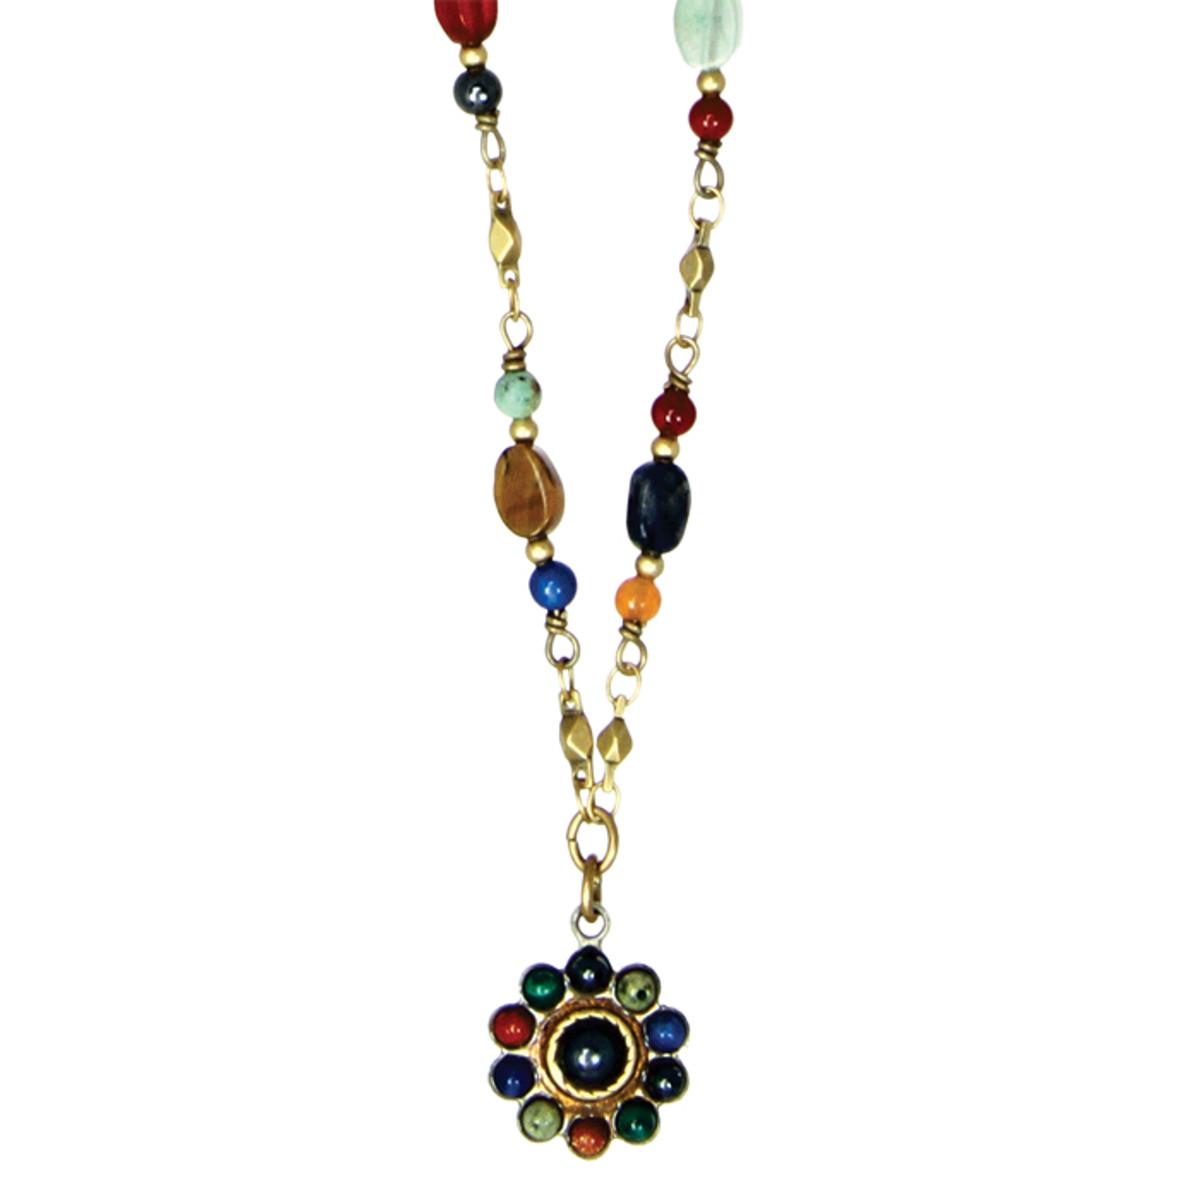 Michal Golan Necklace - Durango Small Round Chain Bead